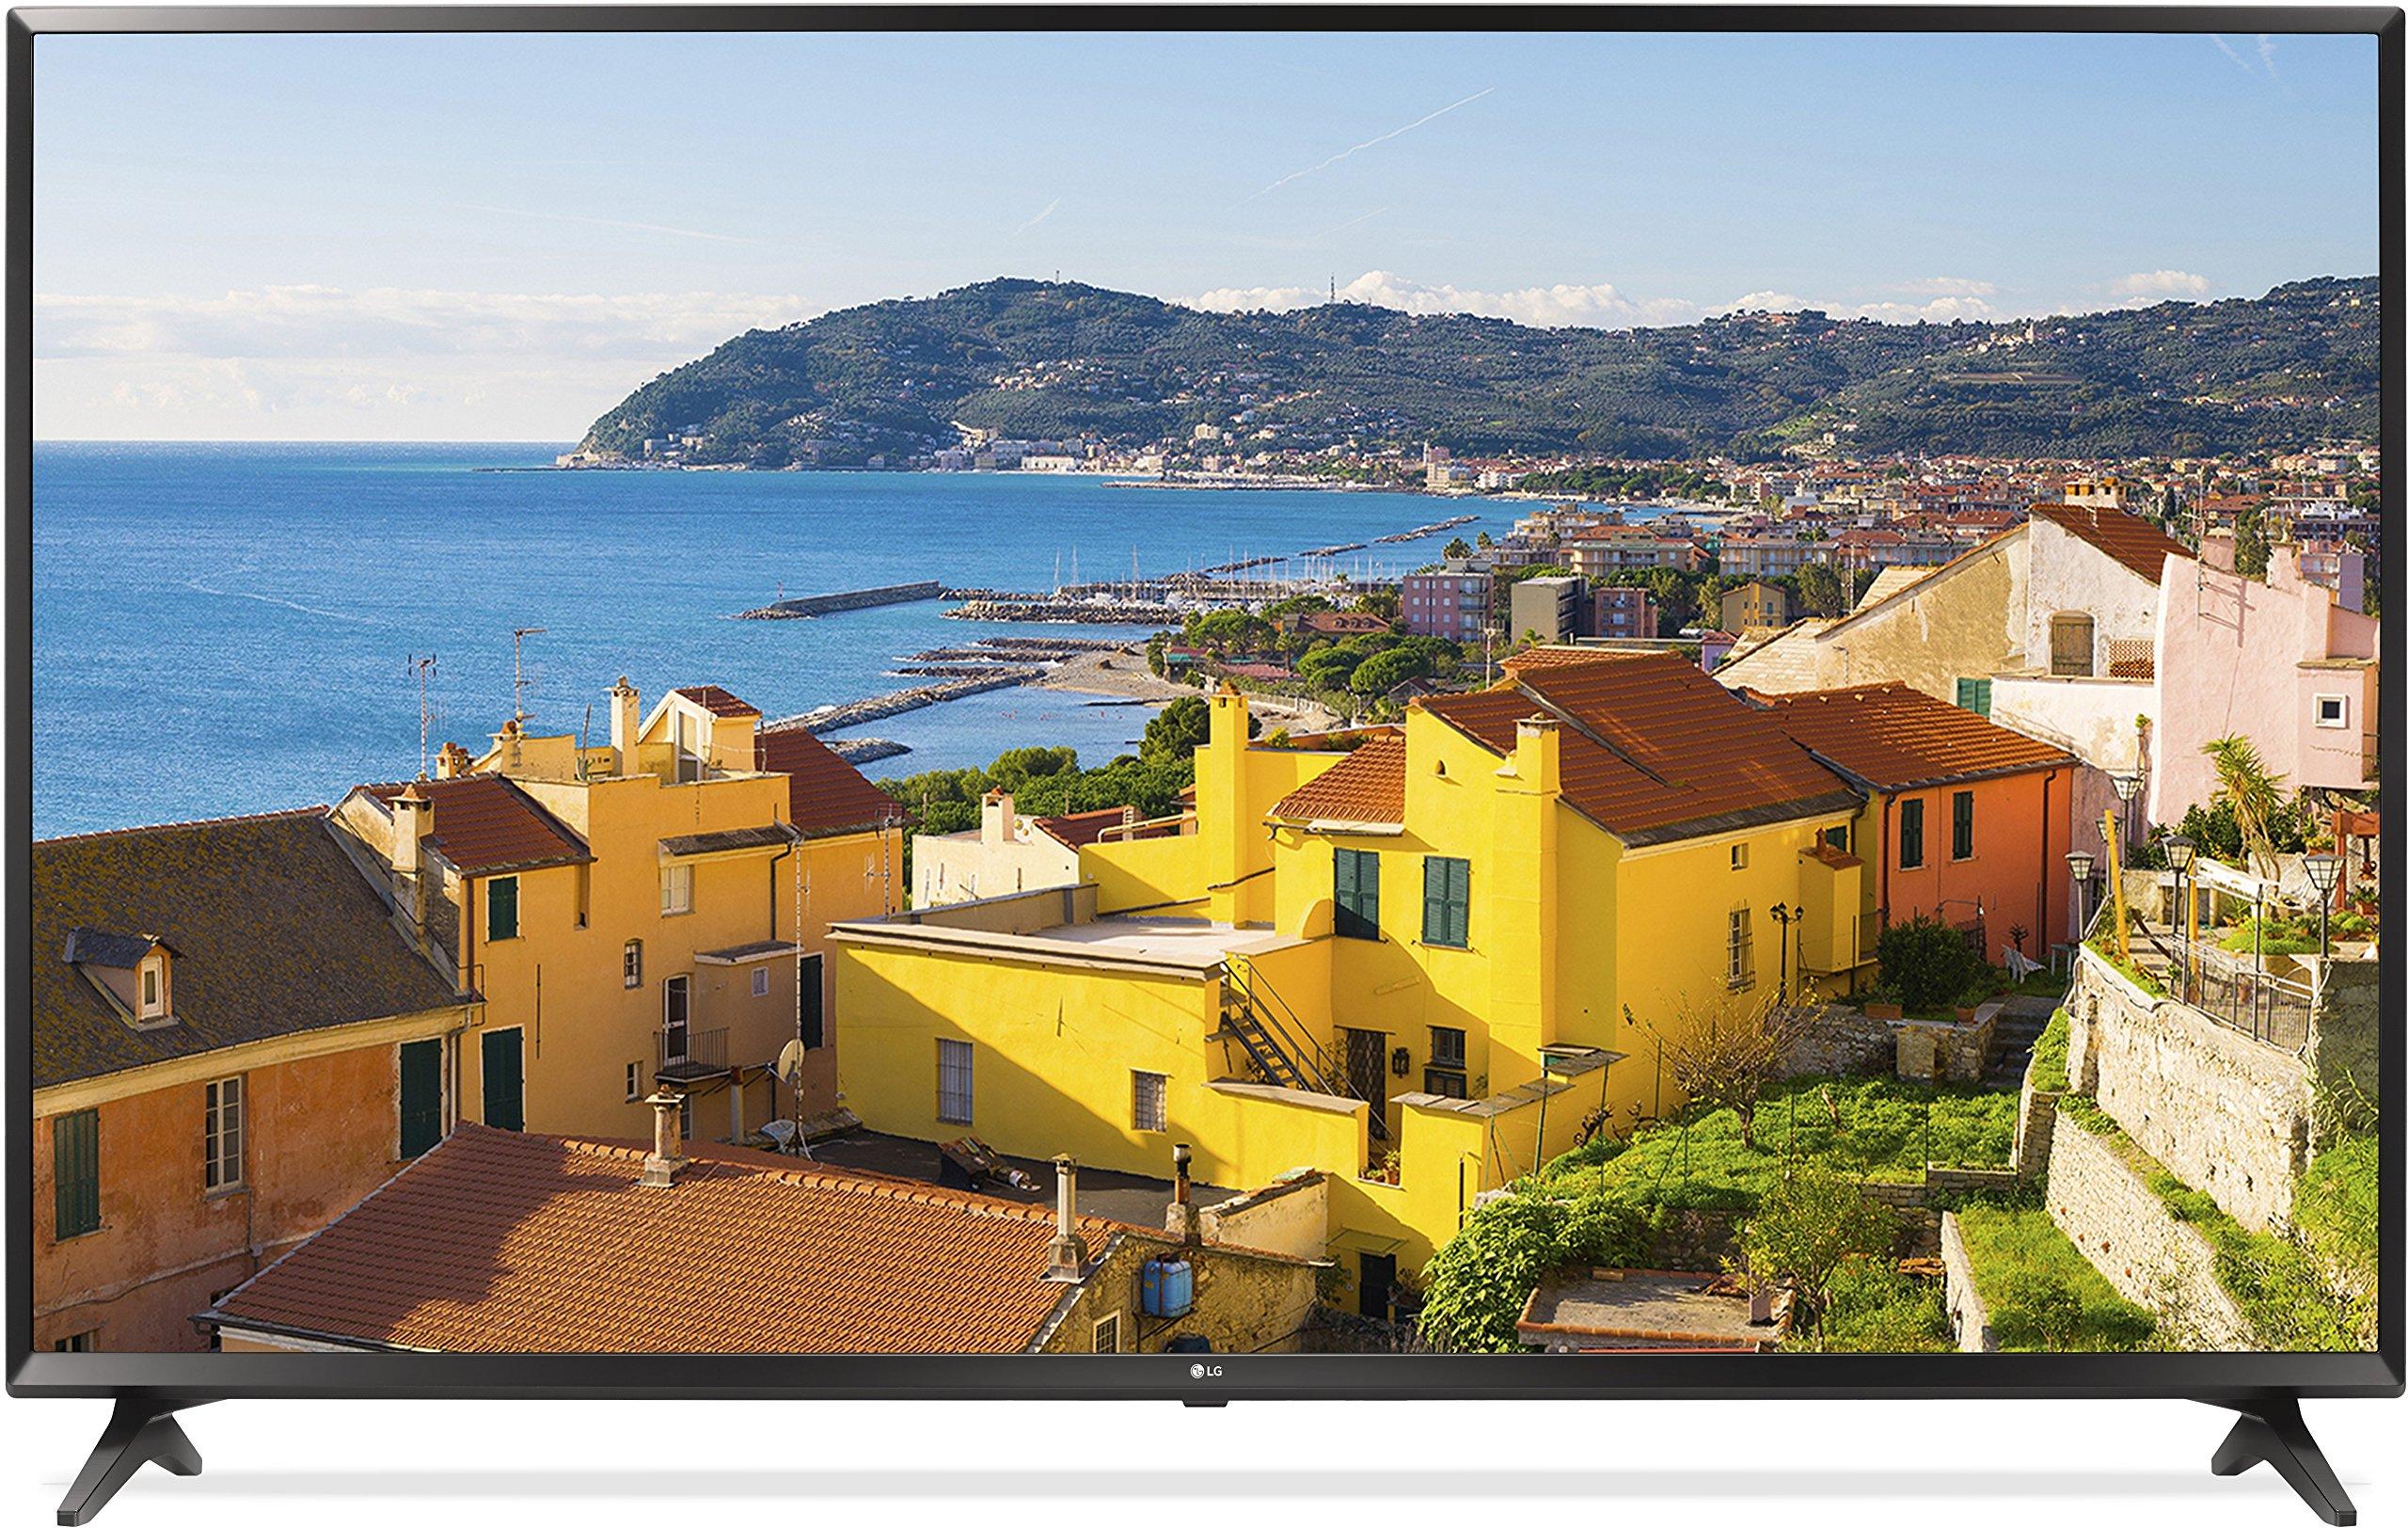 Televisor LG 65UJ6309 (4K Ultra HD, Triple Tuner, Smart TV, Active HDR): Amazon.es: Electrónica